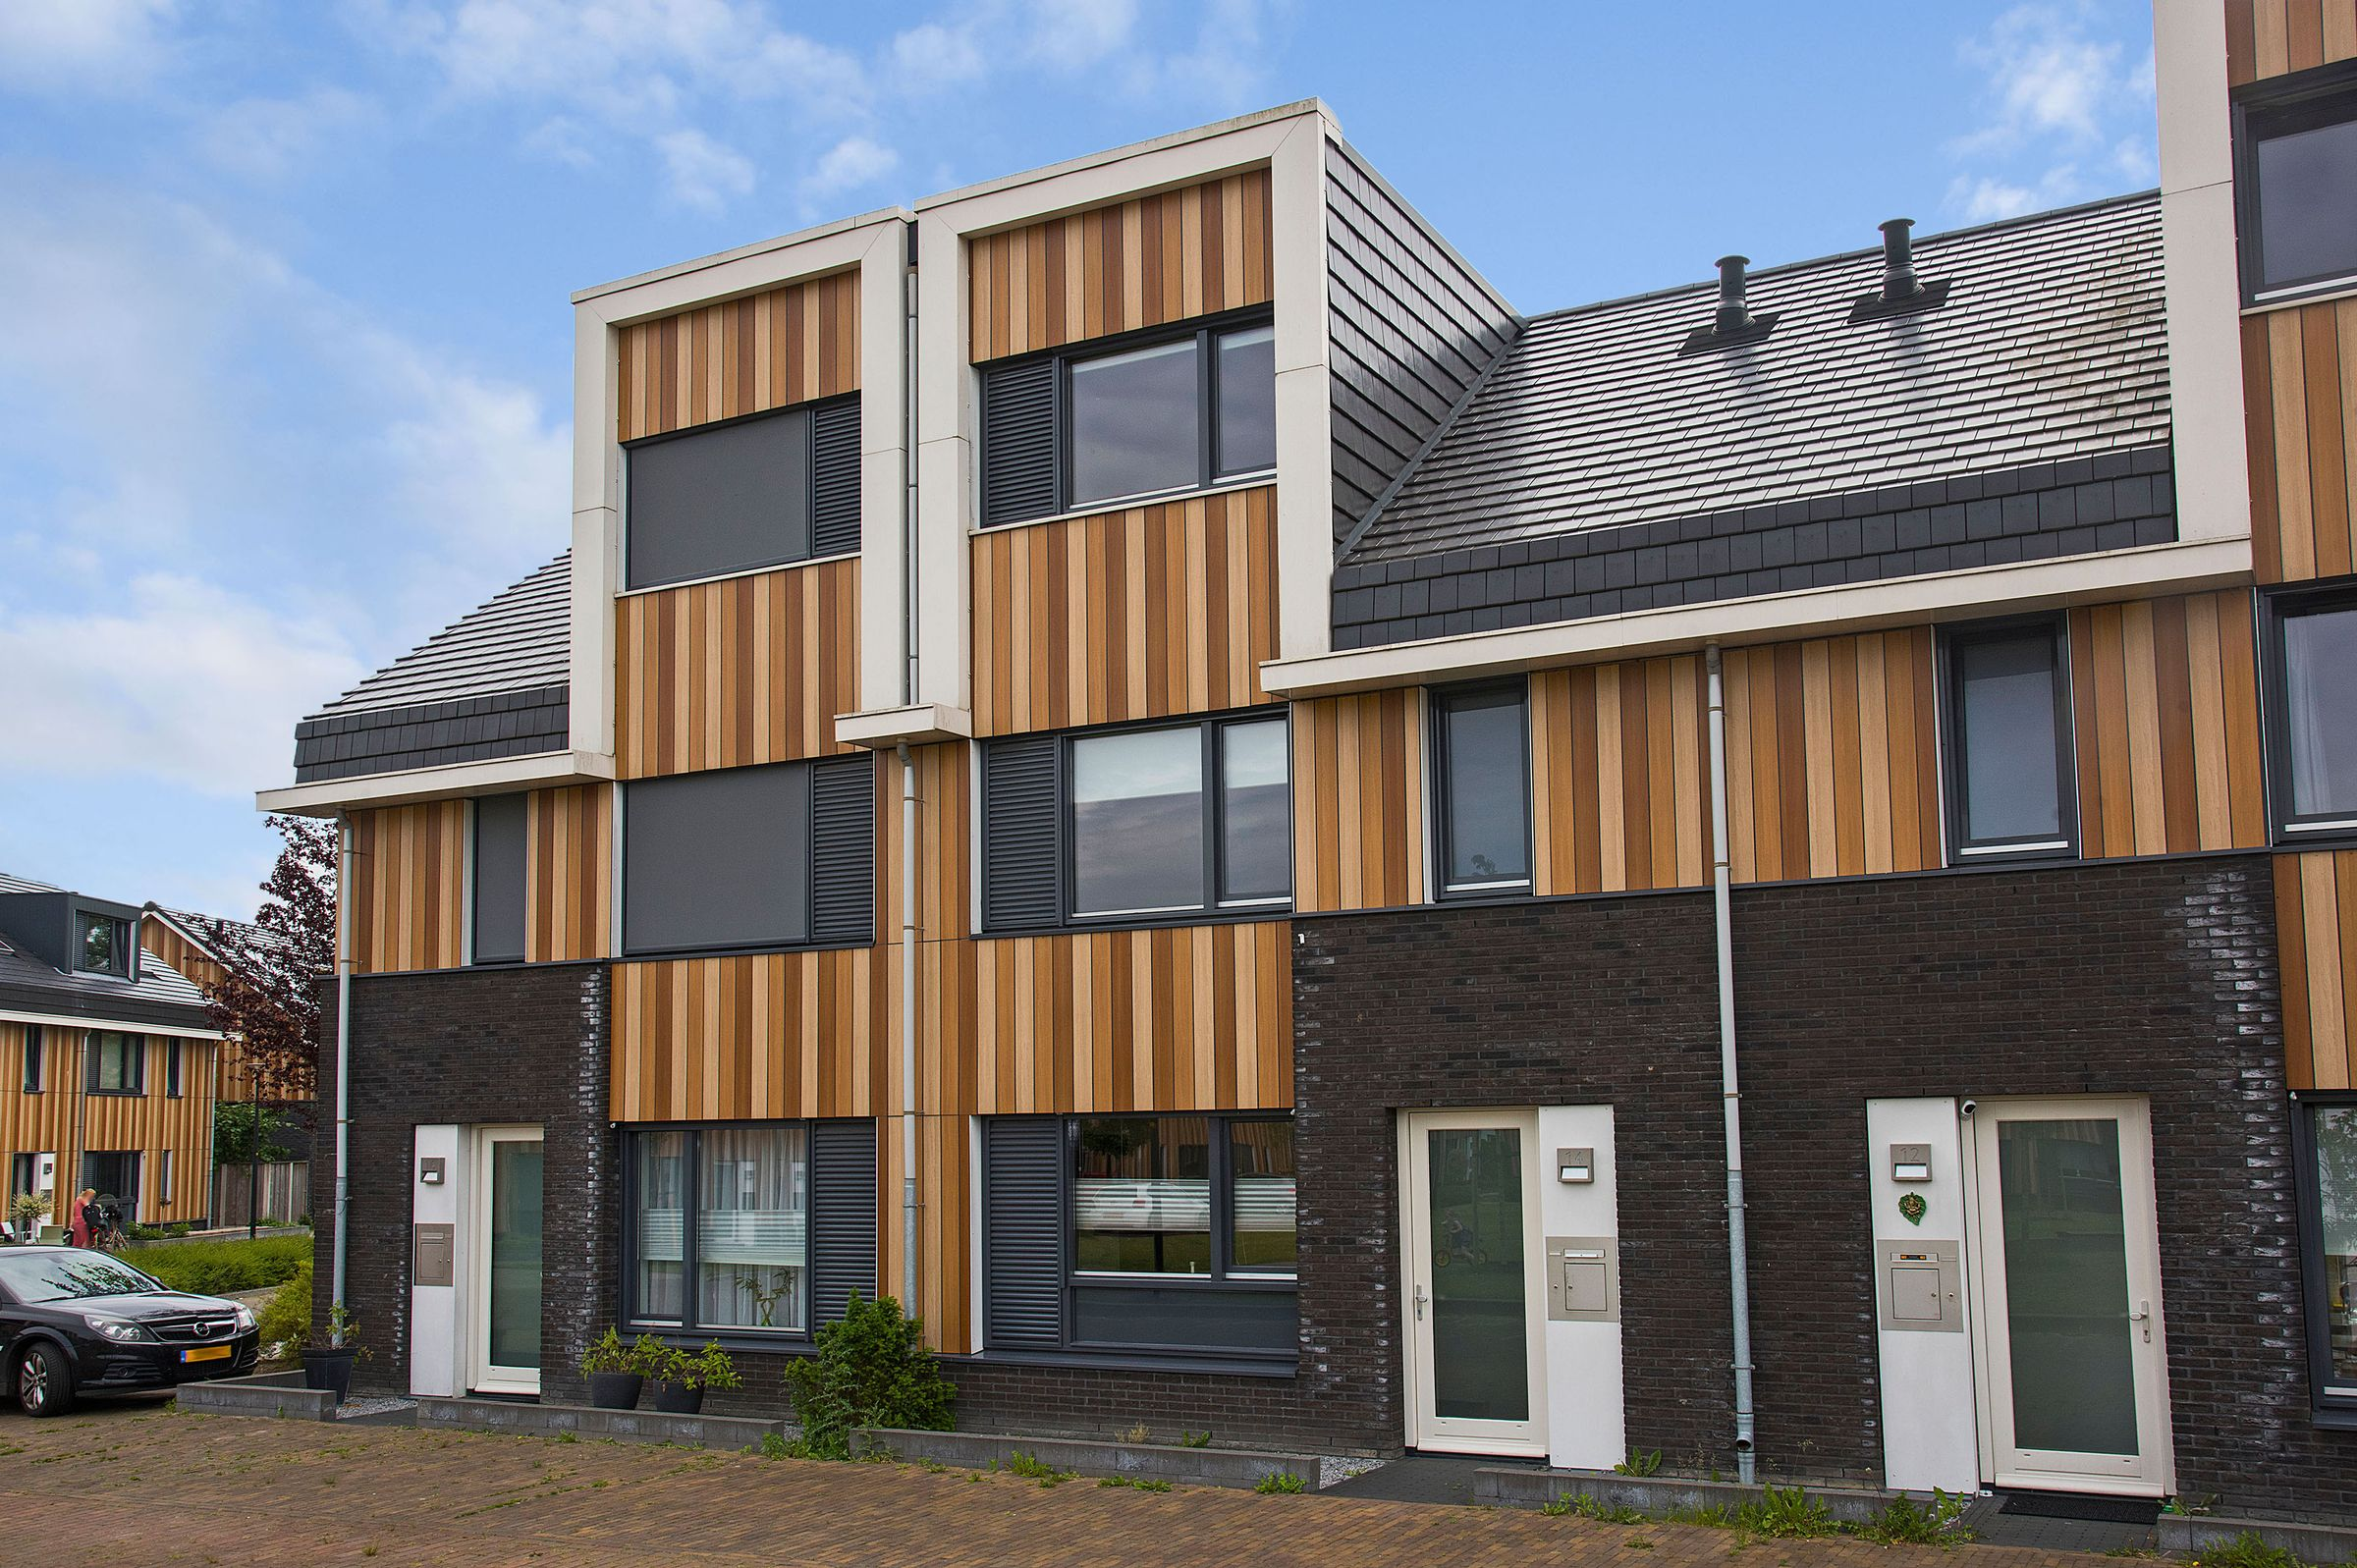 Coulombstraat 14, Enschede